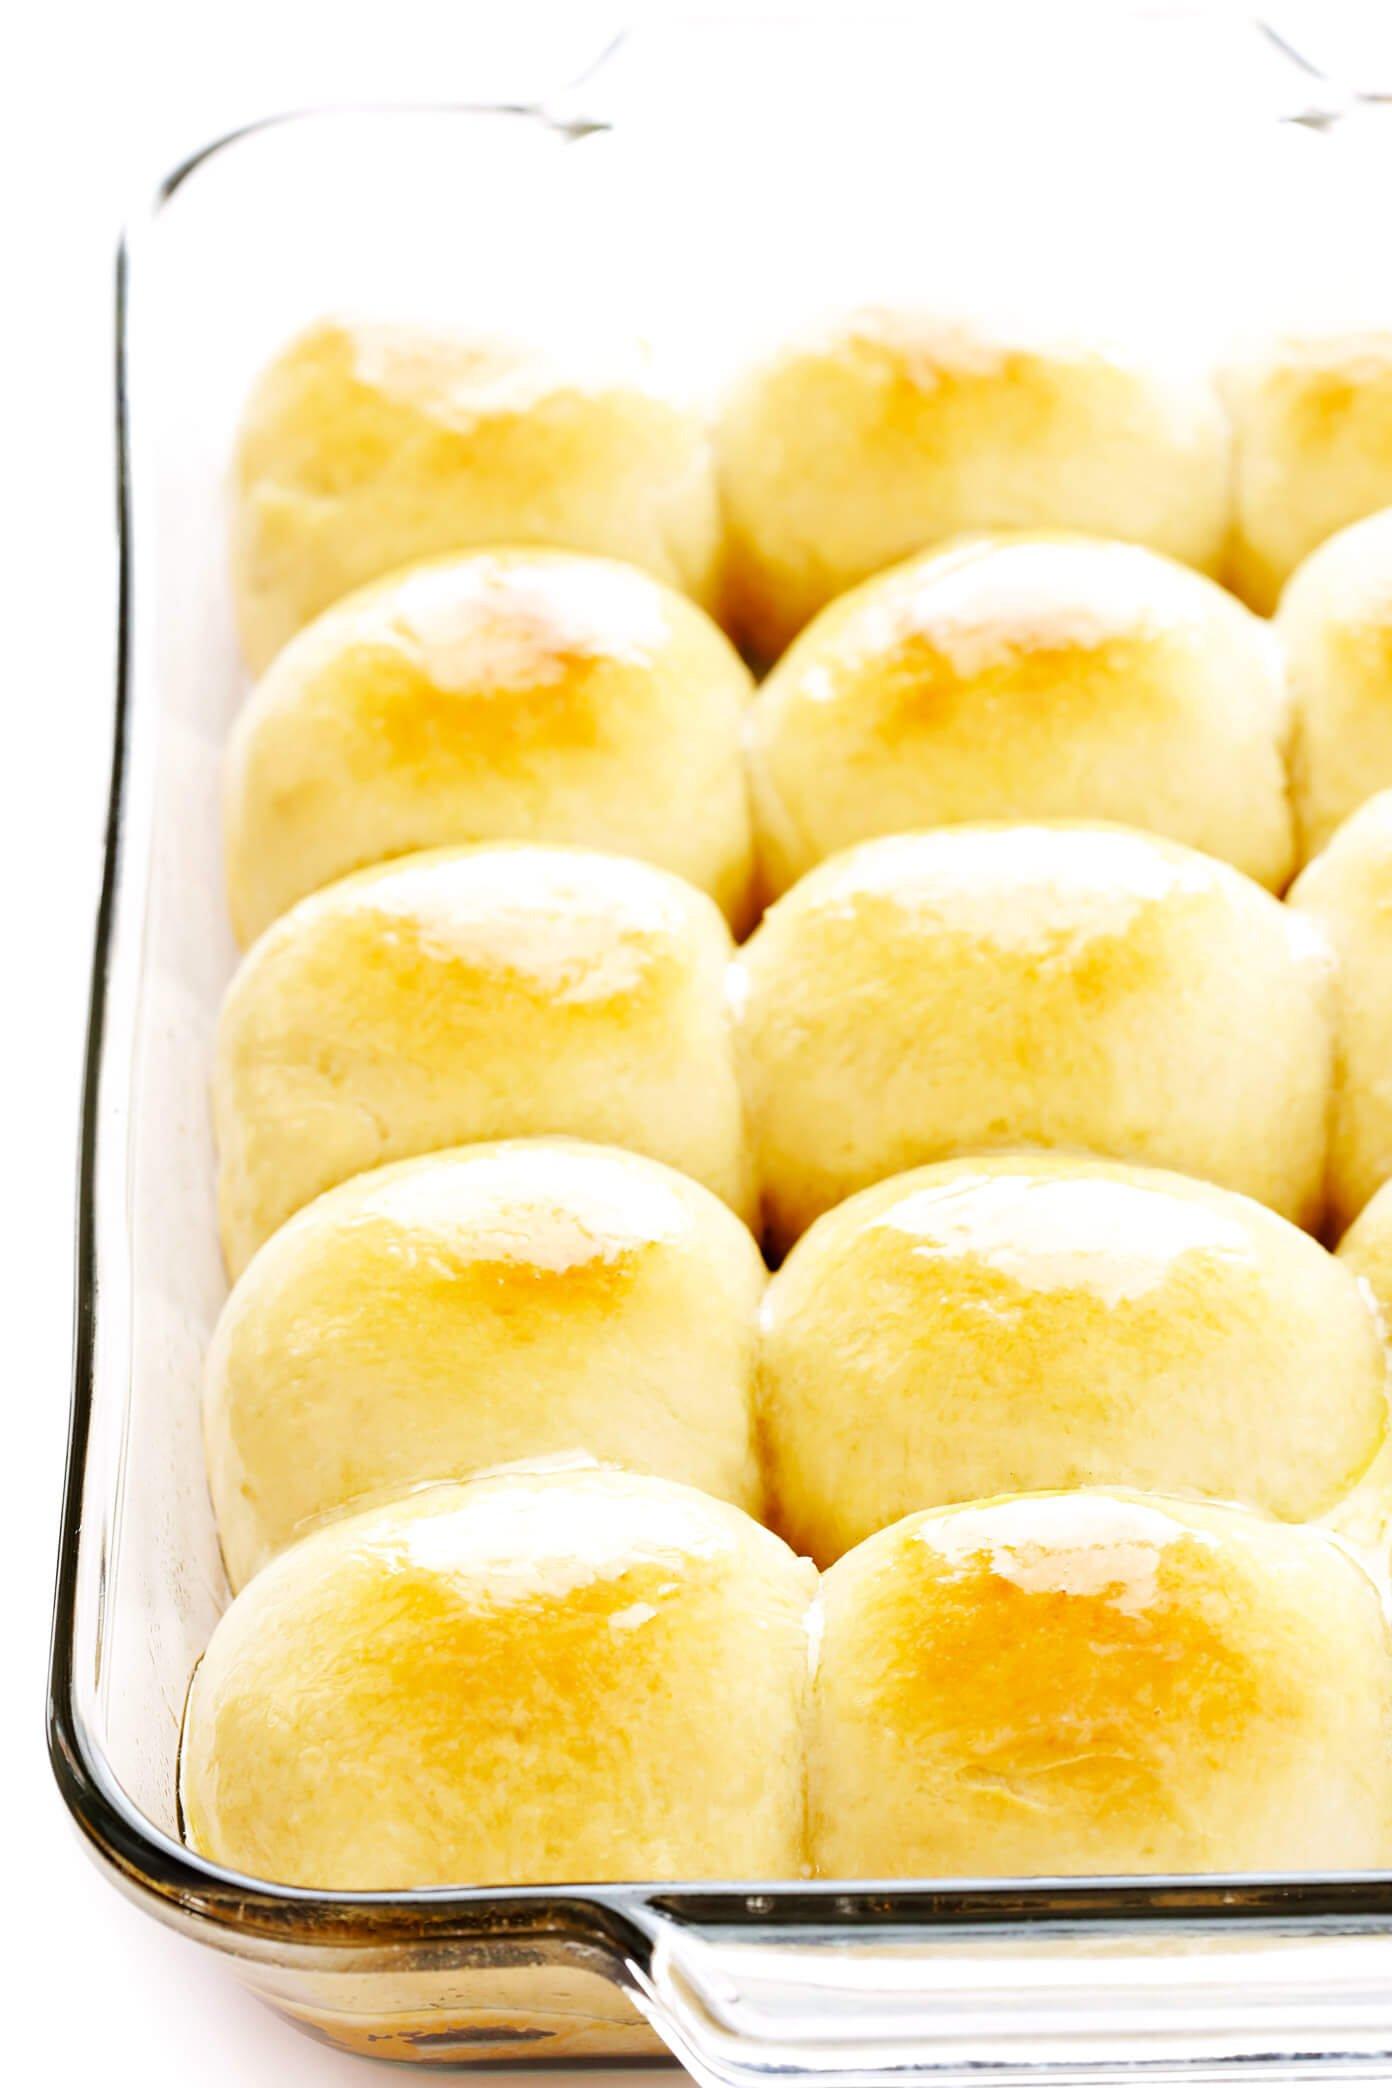 1-Hour Dinner Rolls Recipe in Baking Dish